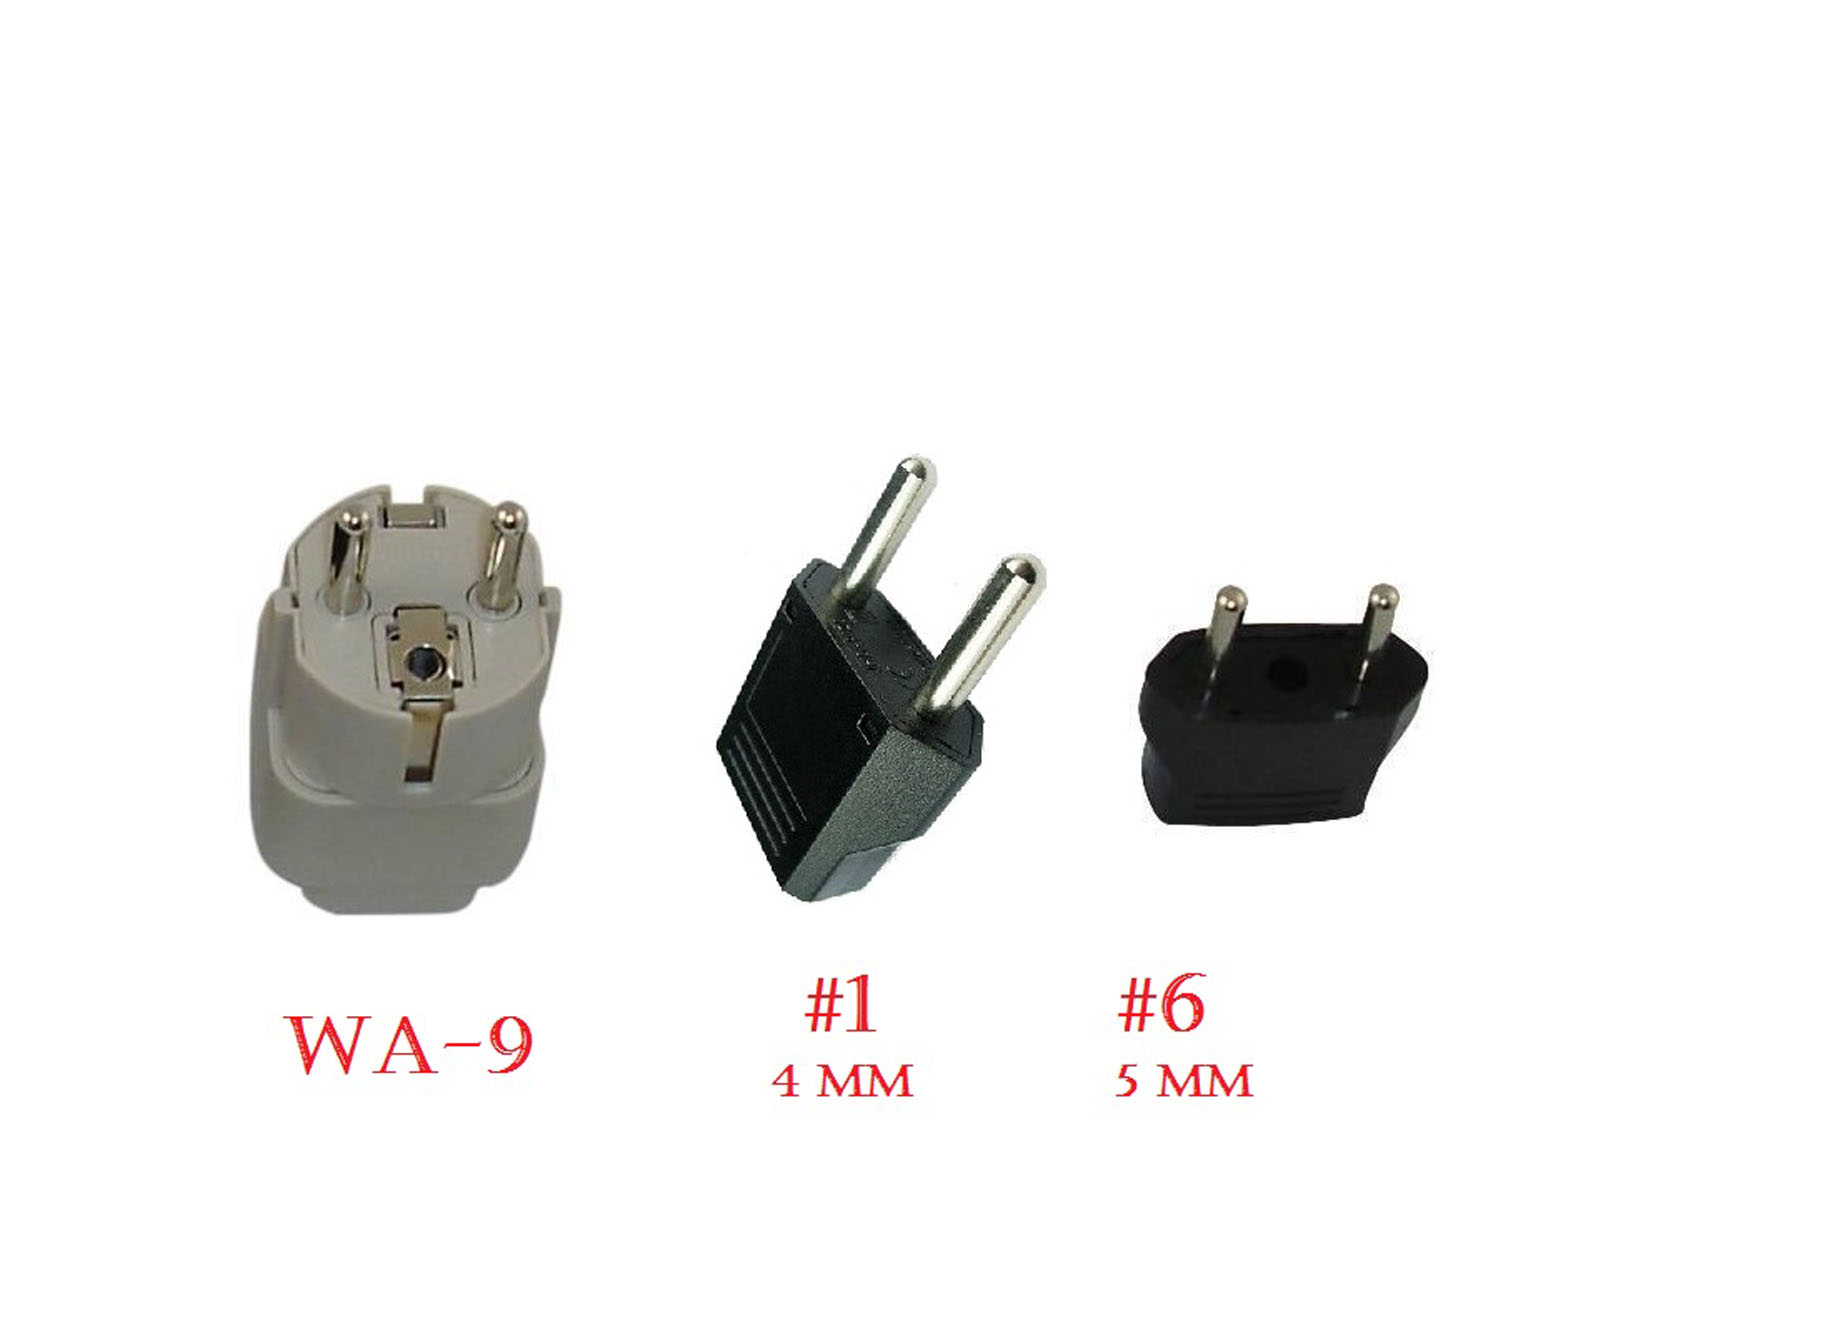 Regvolt Wa-9, #1 & #6